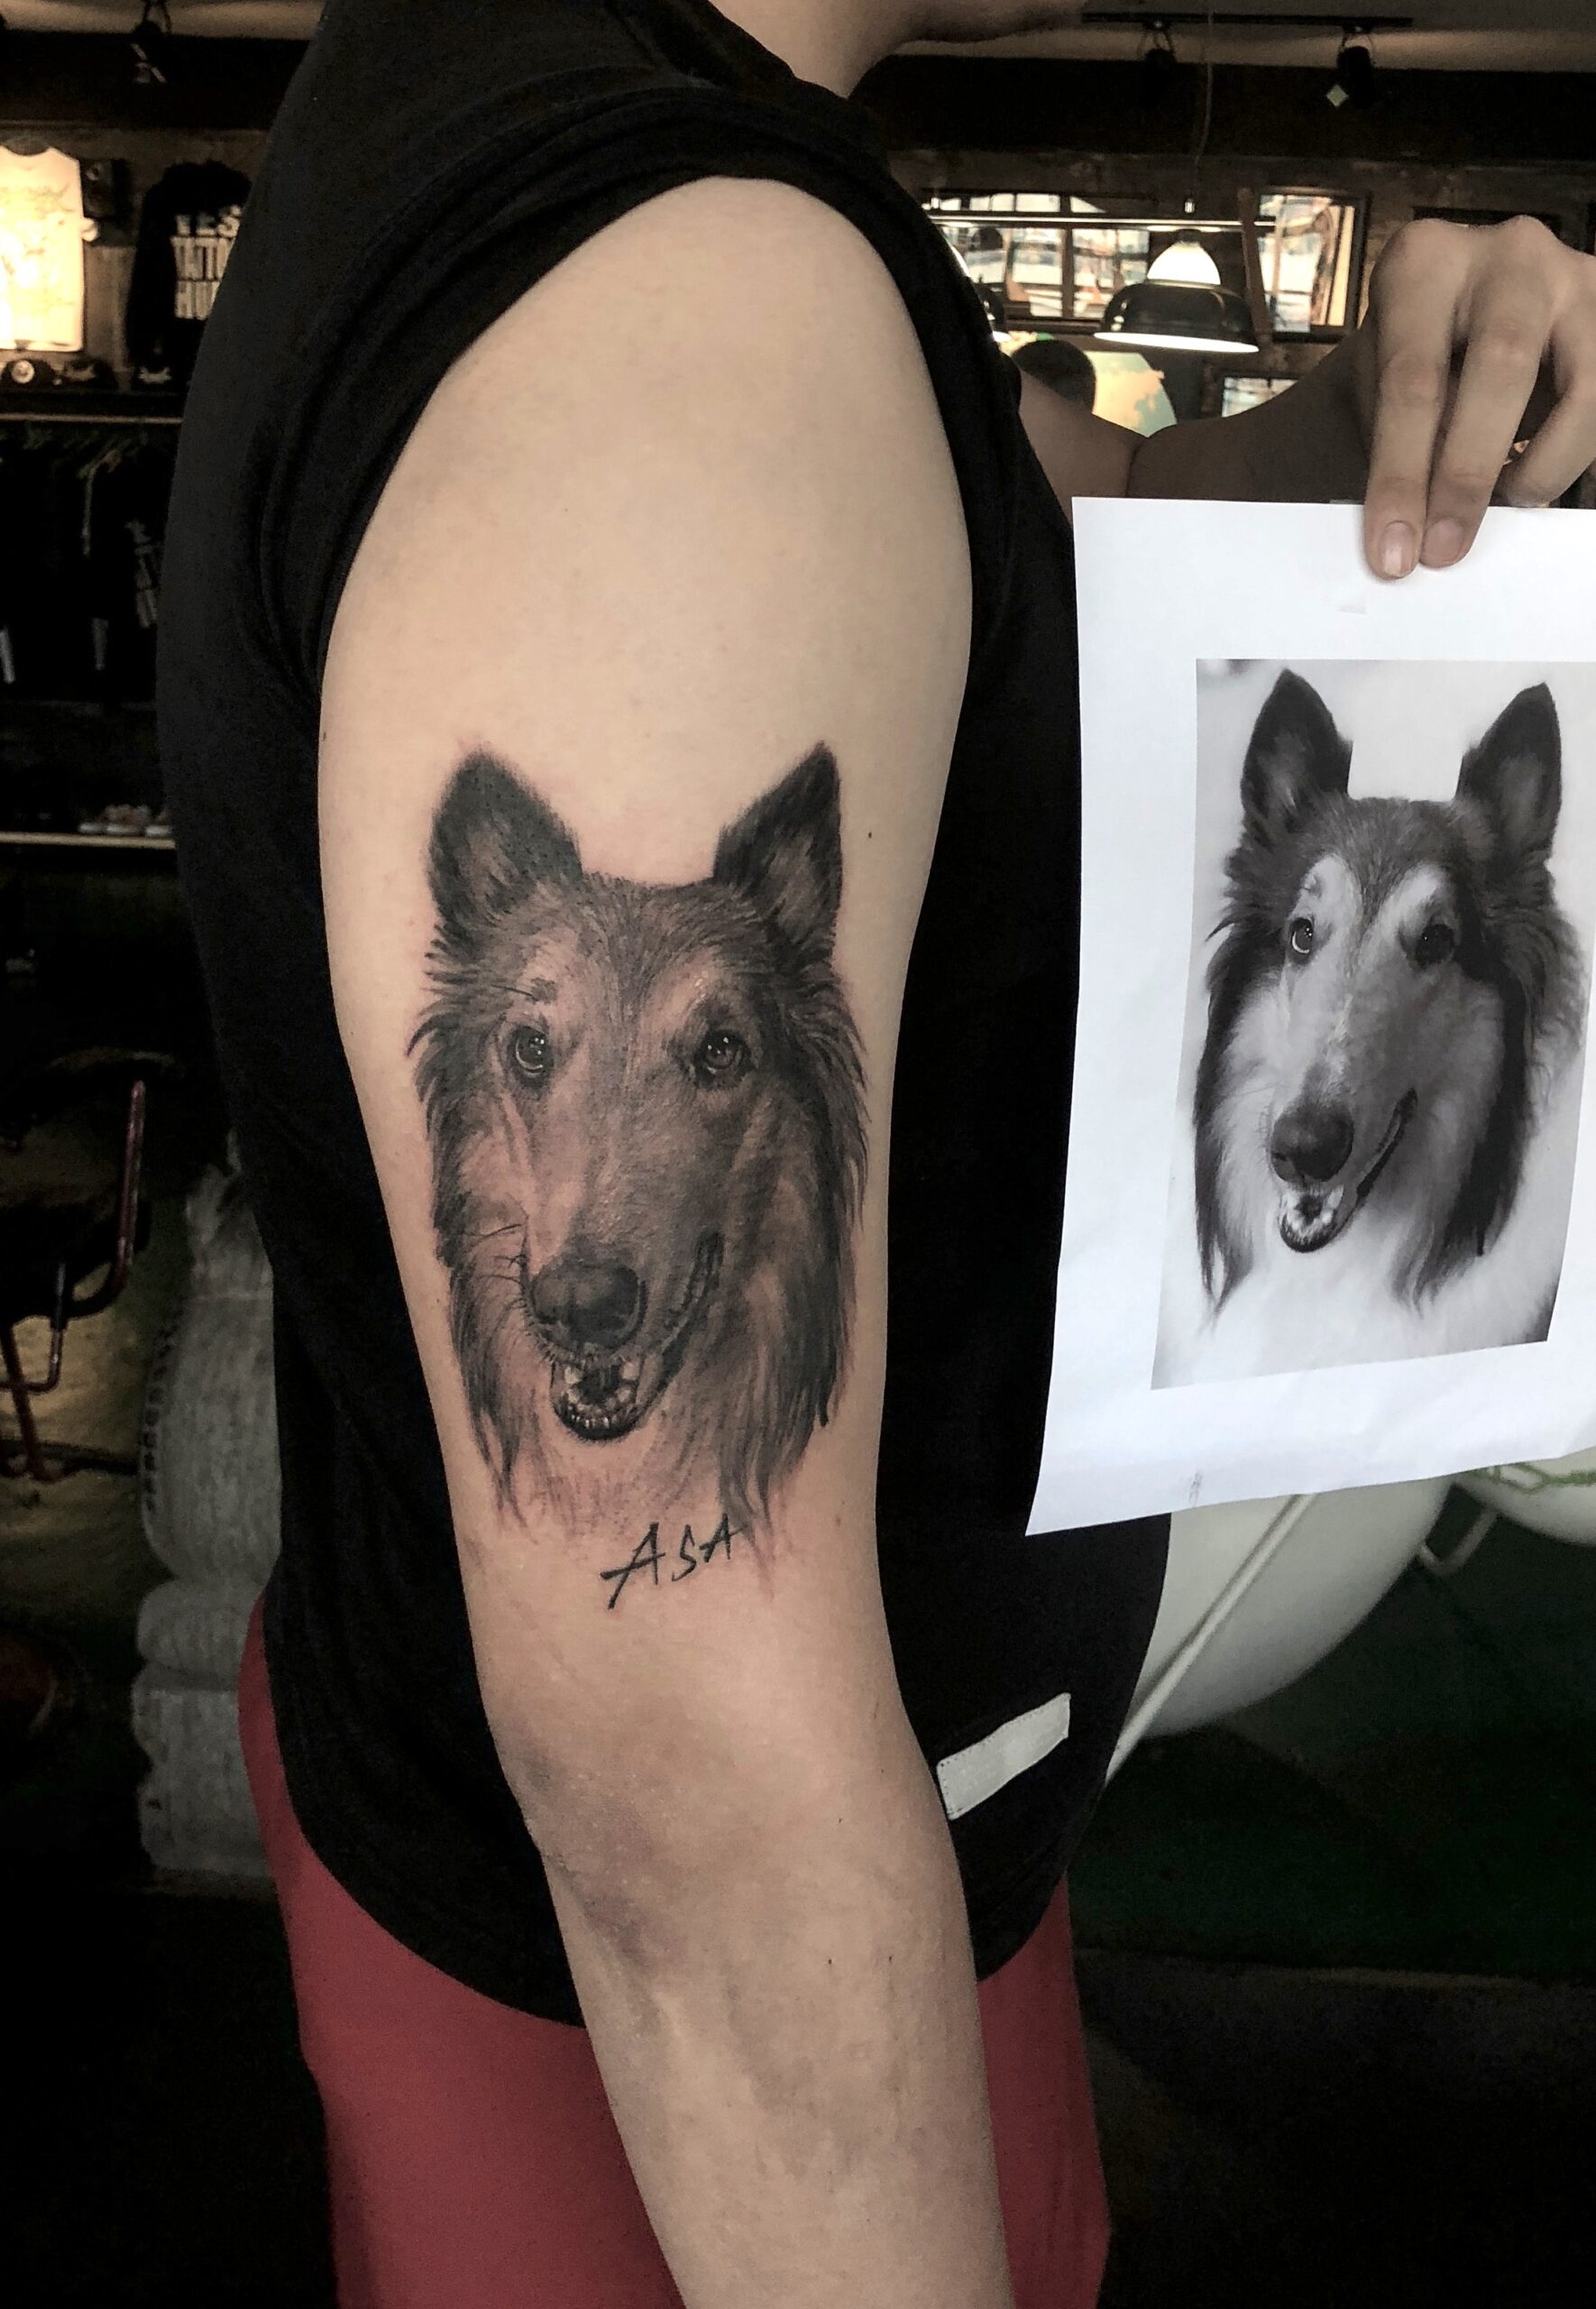 zhuo dan ting tattoo work 卓丹婷纹身作品 狗肖像纹身黑白 1